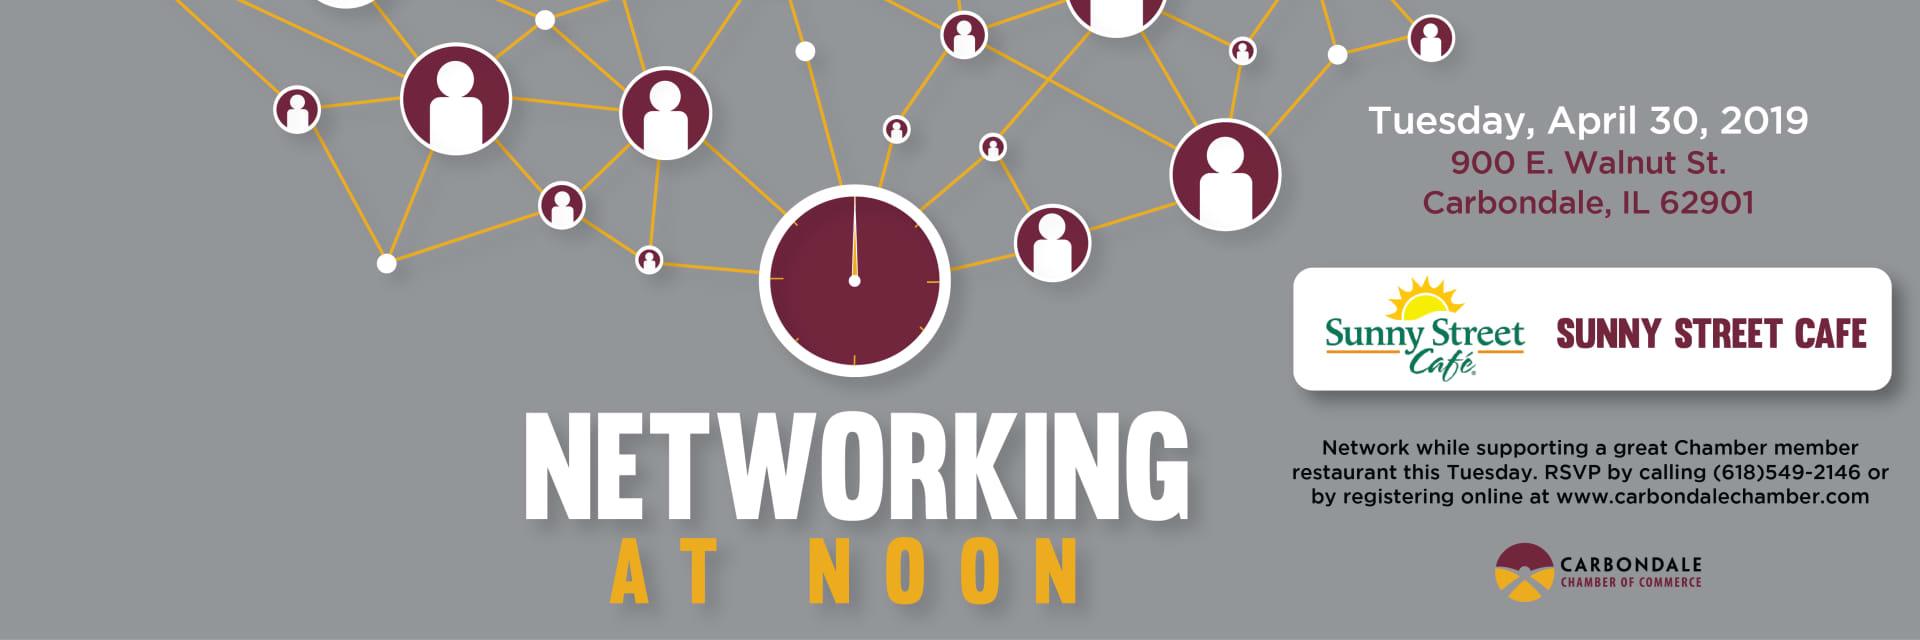 Networking-at-Noon_Apr_Slider-01-w1920.jpg